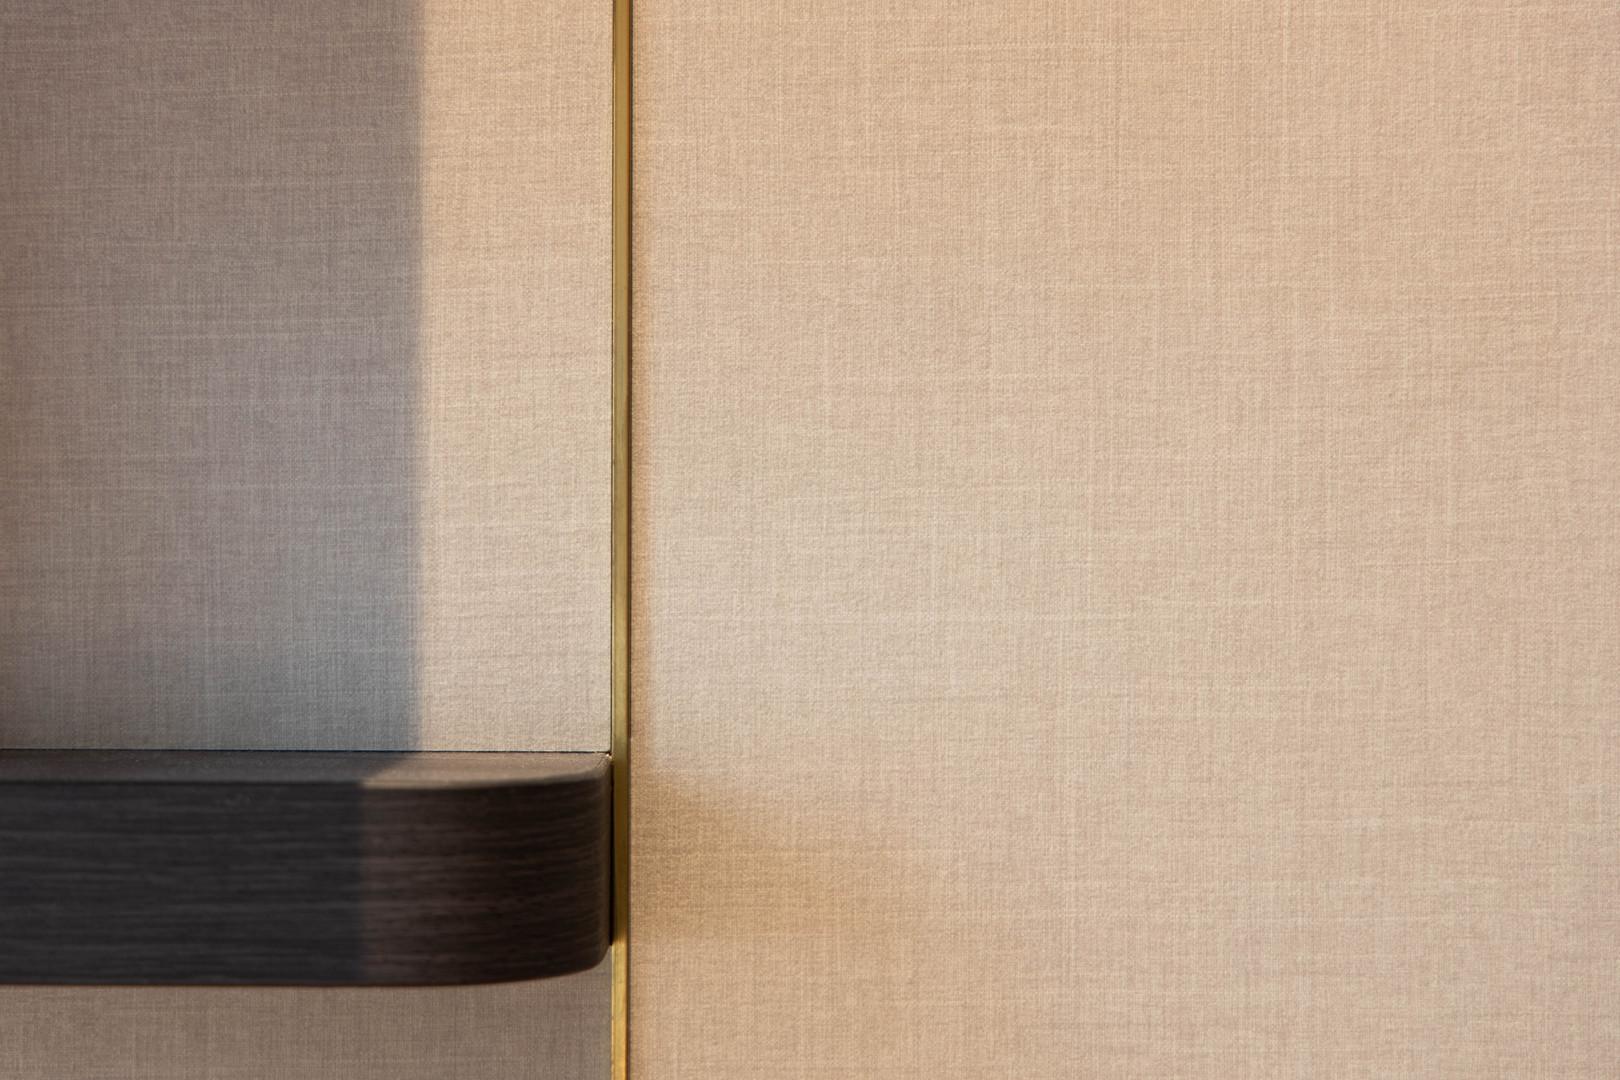 Hock Hoon, Soh Xin Hui, Ng Ci En, Ng Chin Hok, Chua Min Sheng, Interior Design Singapore, Parc Riviera, Best Carpenter Singapore, Best Interior Designer Singapore, luxe interior, parc riviera, Alfred wei jie, open shelves, tv console, mirror interior, modern interior, hotel